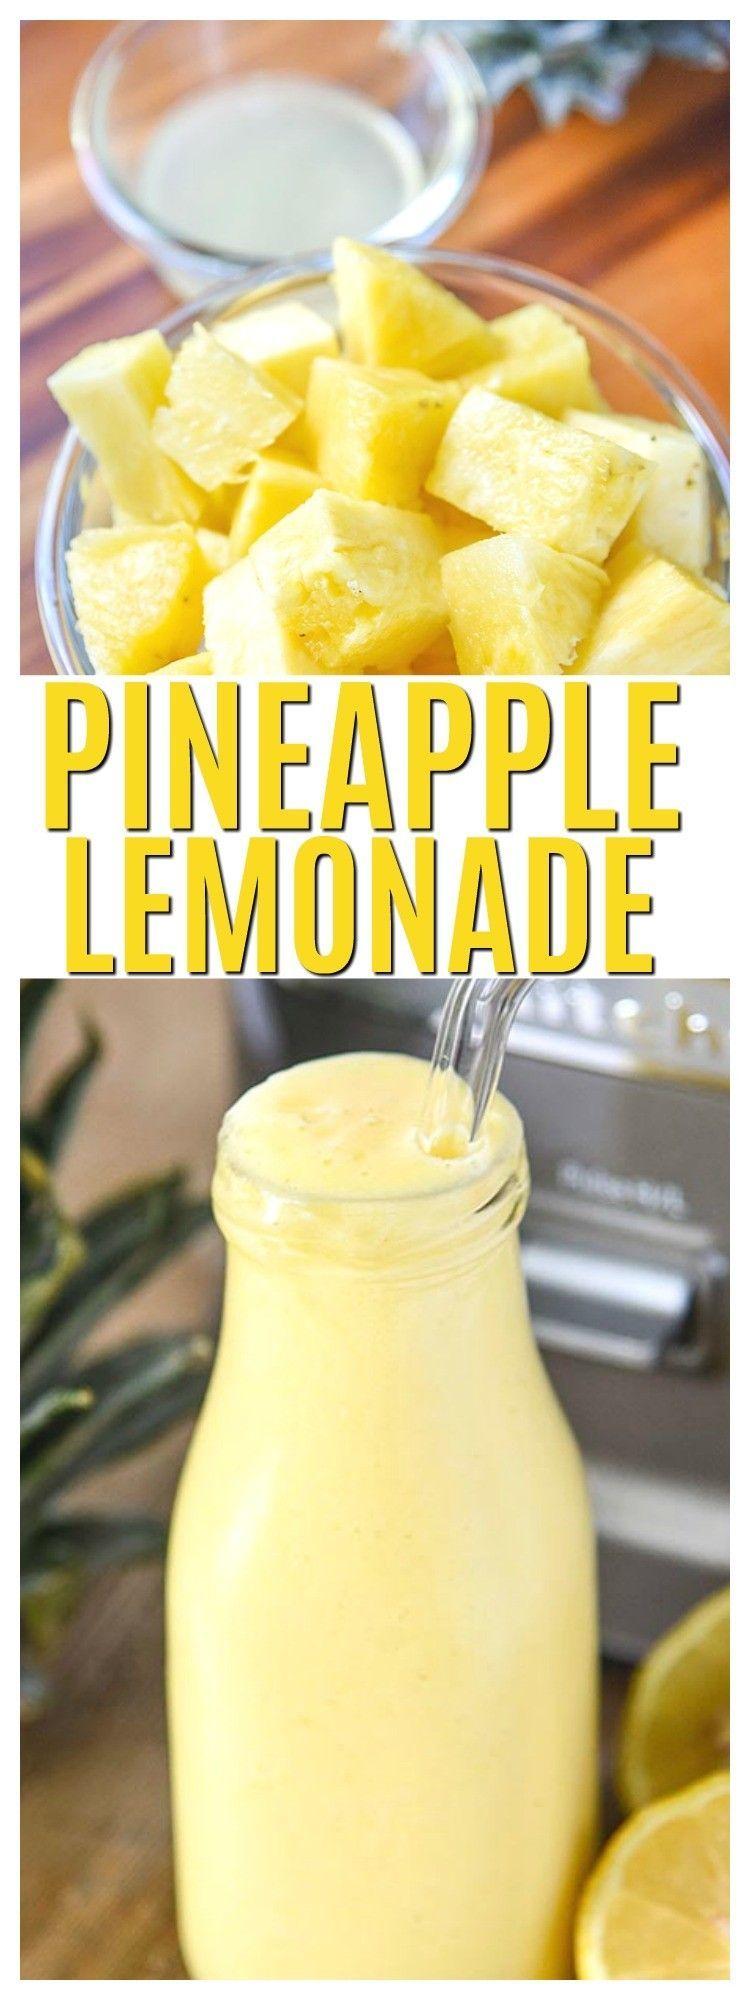 Pineapple Lemonade #easylemonaderecipe